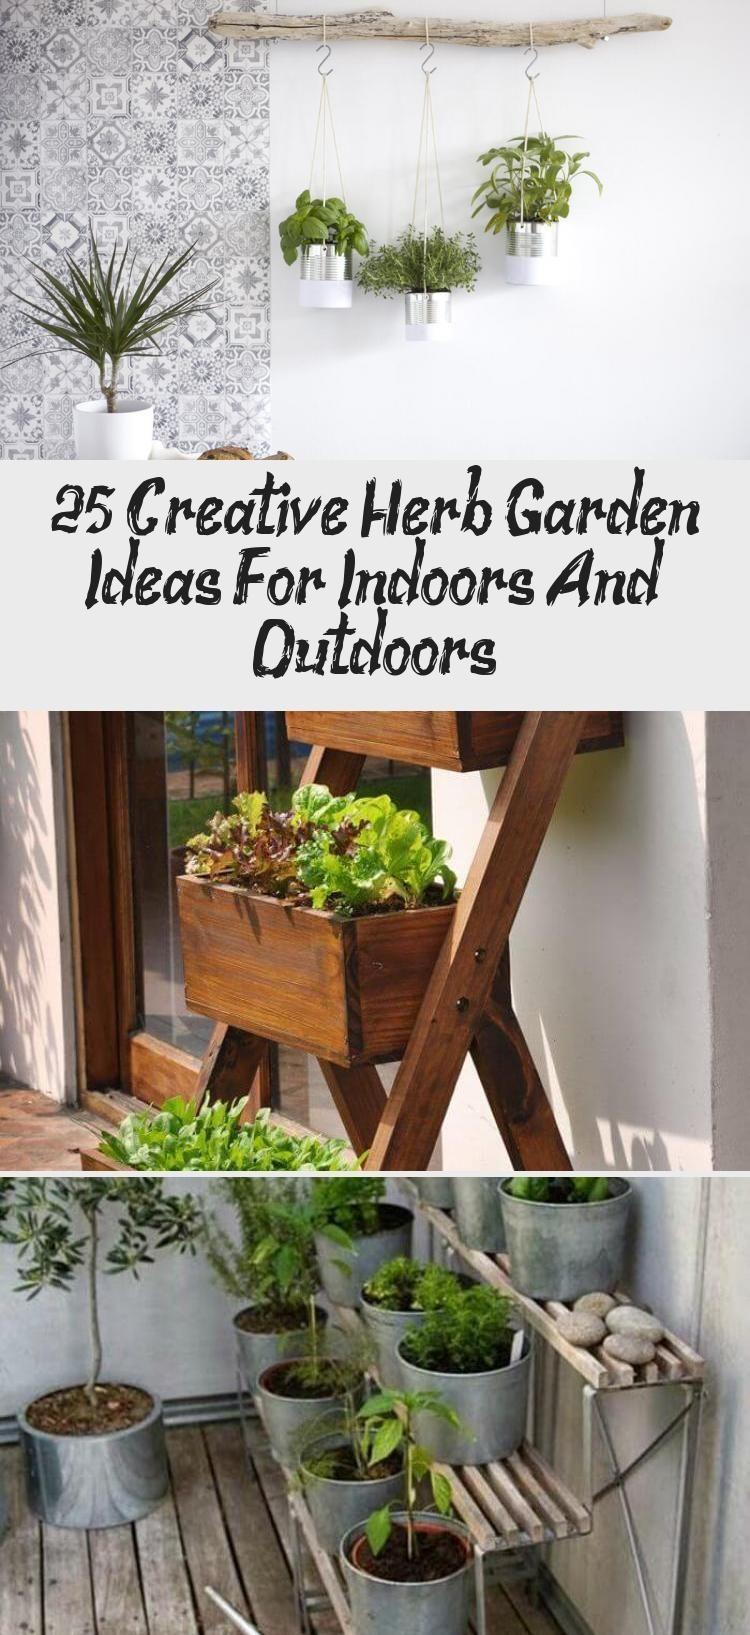 25 creative herb garden ideas for indoors and outdoors windowherbgardens ladde creati on outdoor kitchen herb garden id=86968